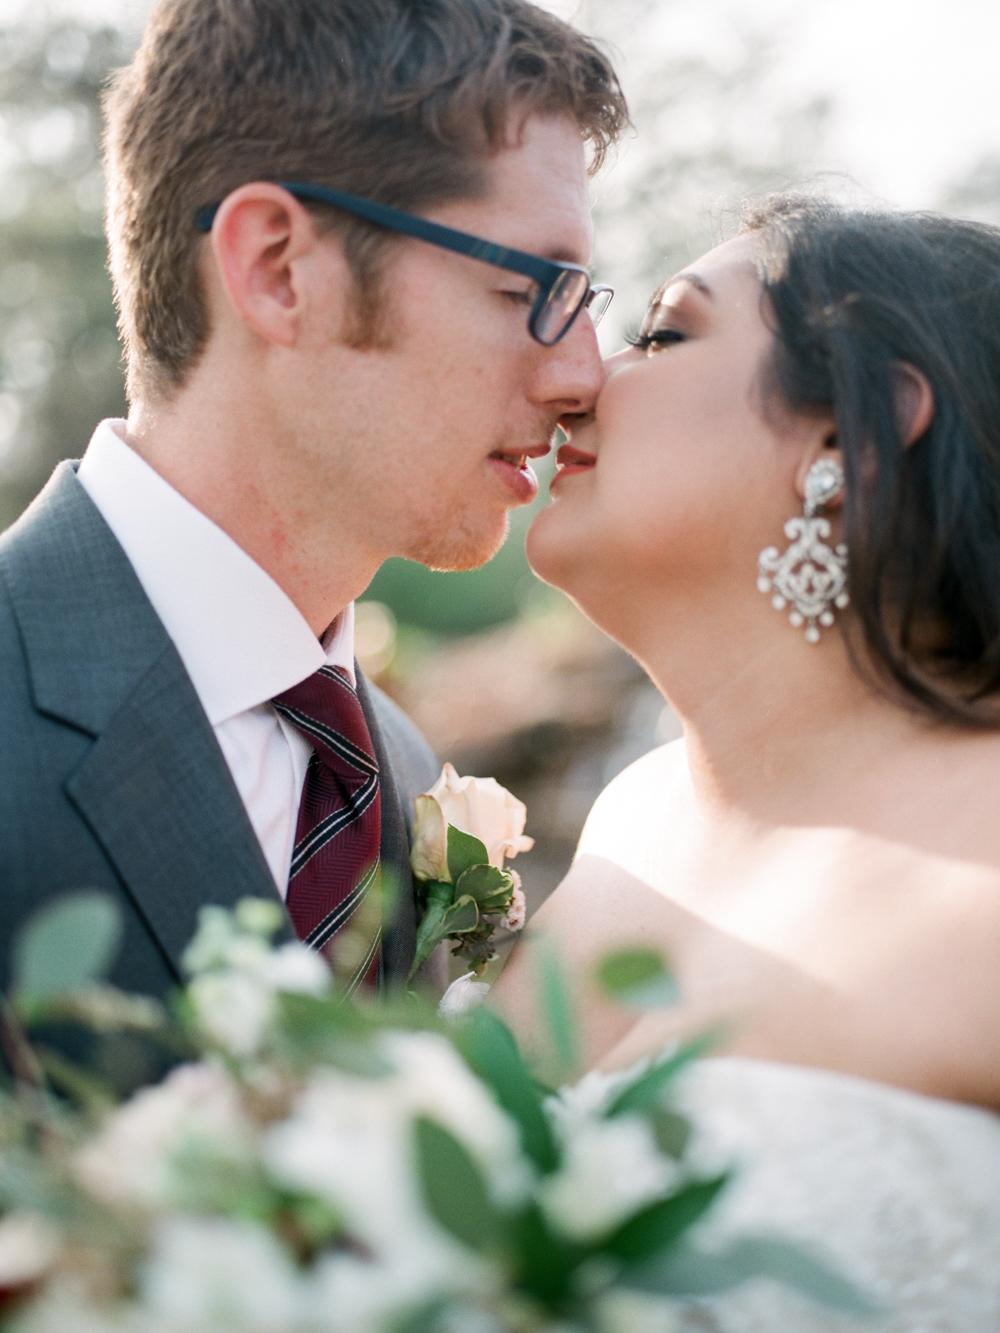 Christine Gosch - destination film photographer - houston wedding photographer - fine art film photographer - elopement photographer - destination wedding - understated wedding - simple beautiful wedding photography-13.jpg